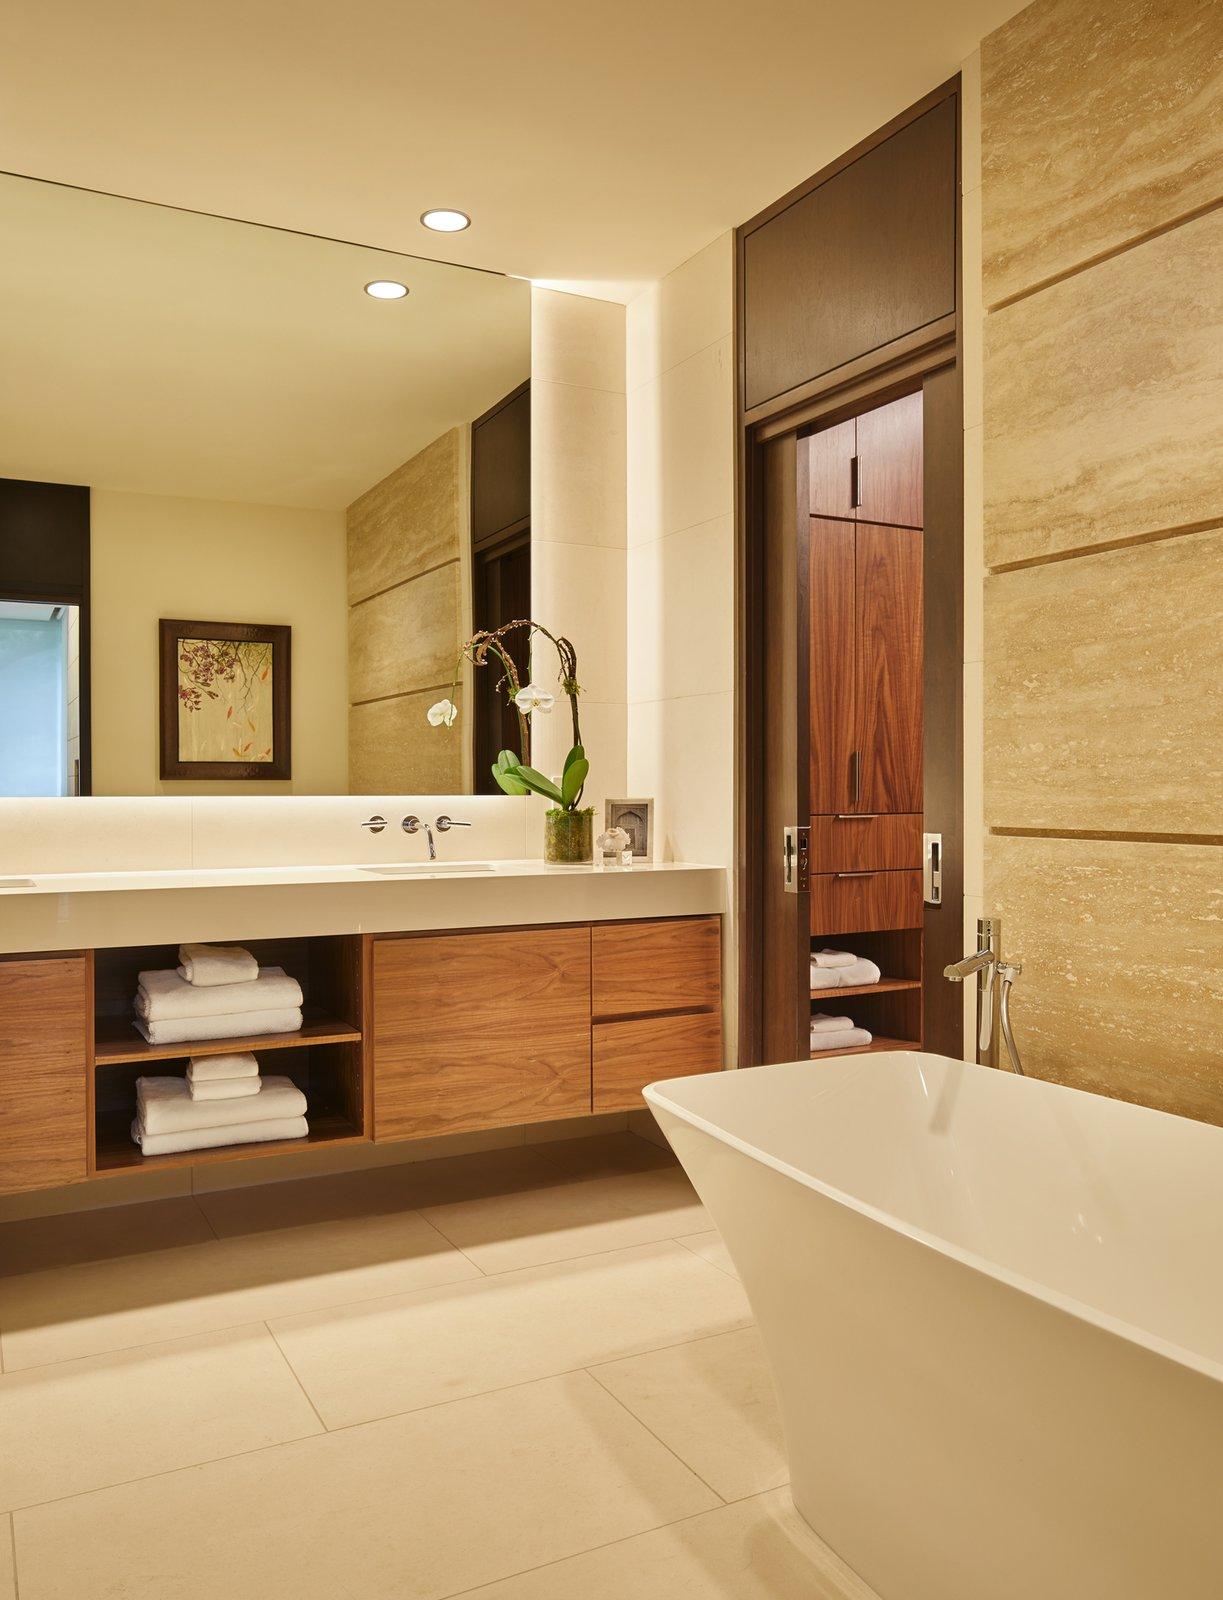 Bath Room, Undermount Sink, Freestanding Tub, Ceramic Tile Floor, Ceiling Lighting, Marble Counter, and Recessed Lighting Master bathroom.  Bent Tree Residence